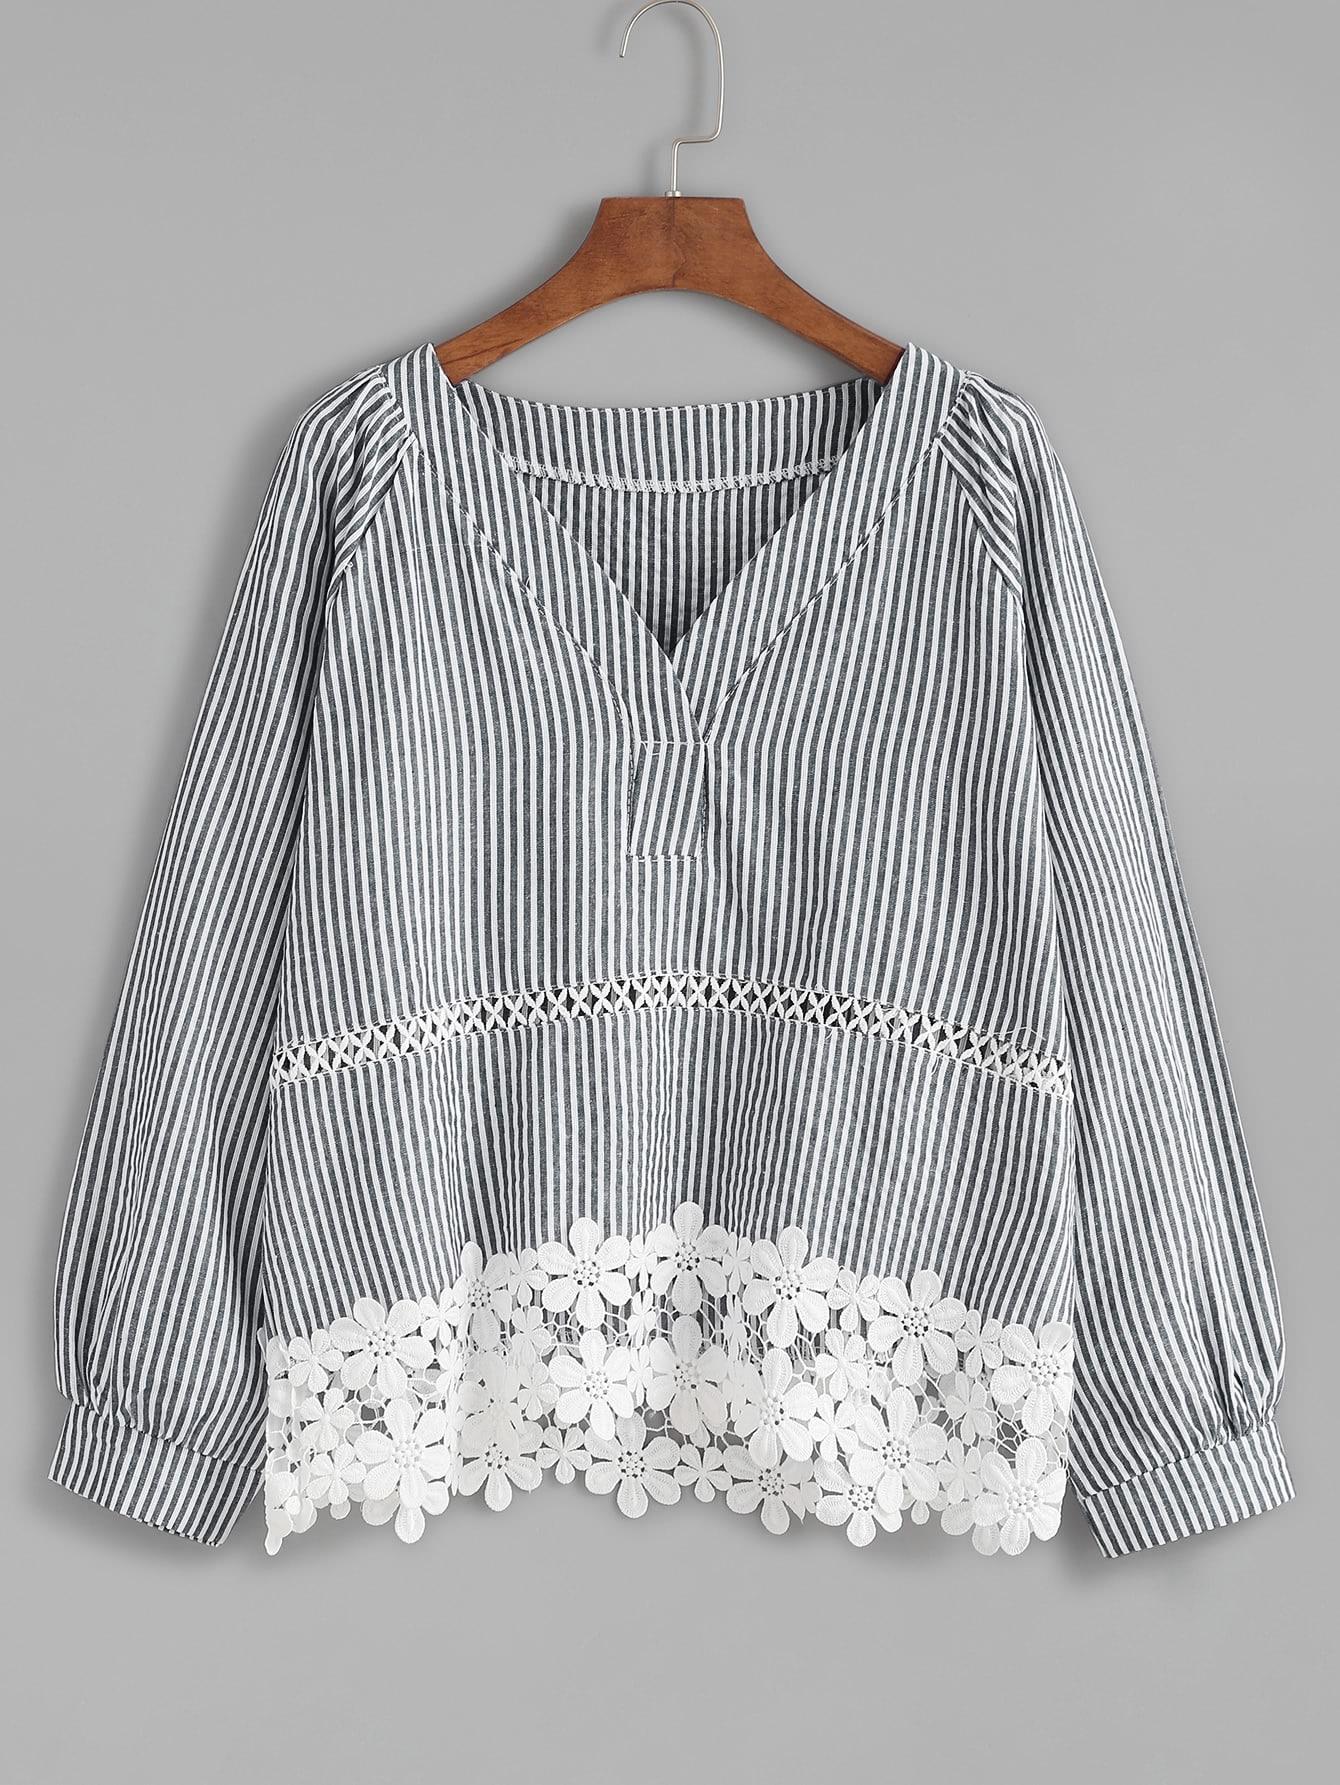 Vertical Striped V Neck Contrast Lace Hem Blouse blouse161010103